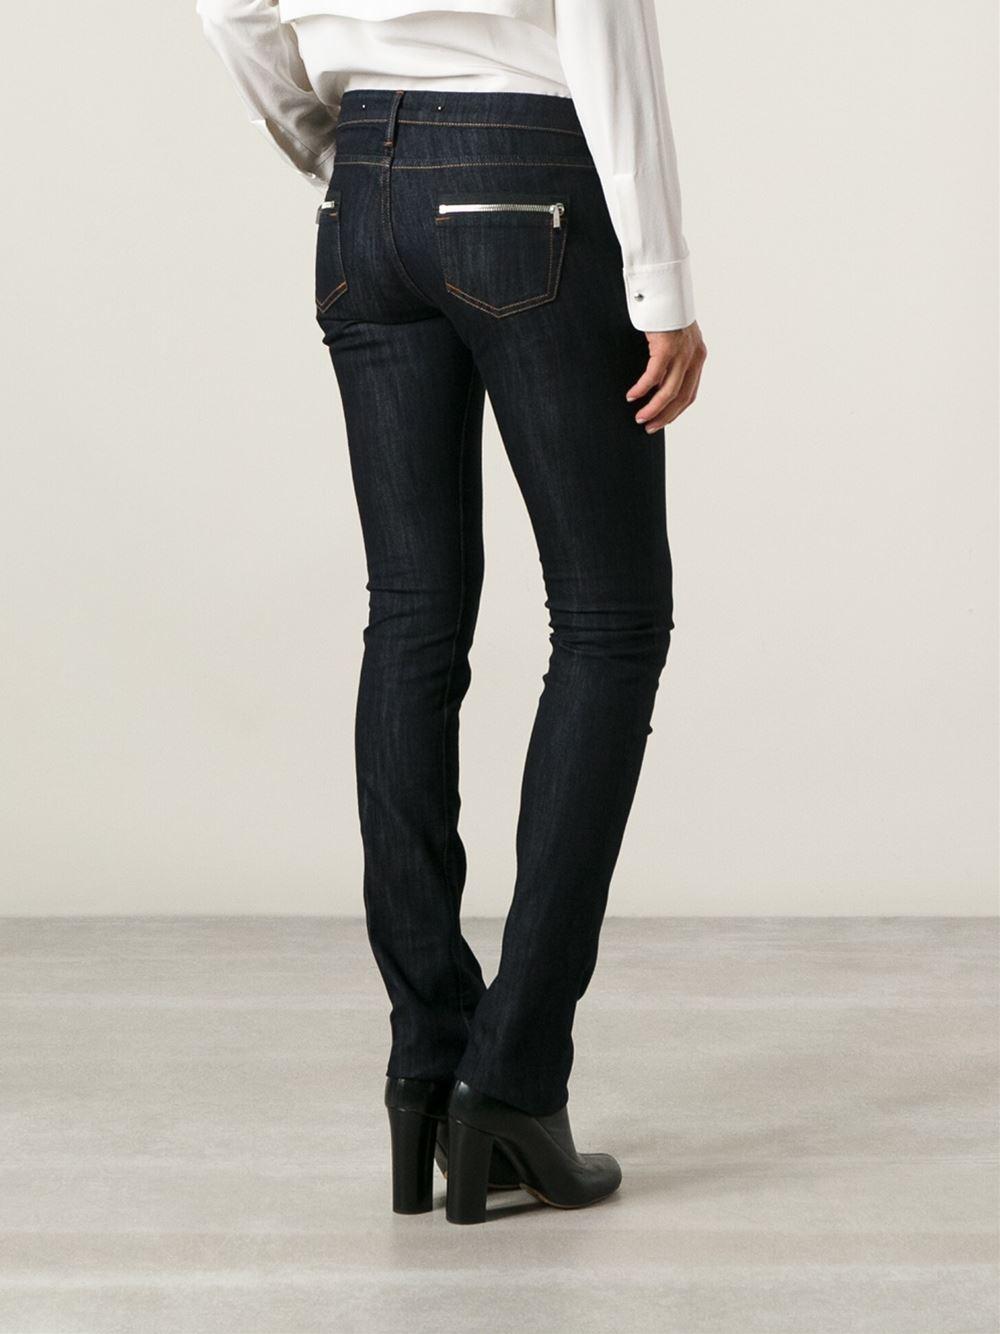 DENIM - Denim trousers Barbara Bui Sale Best Wholesale PFwVEOI